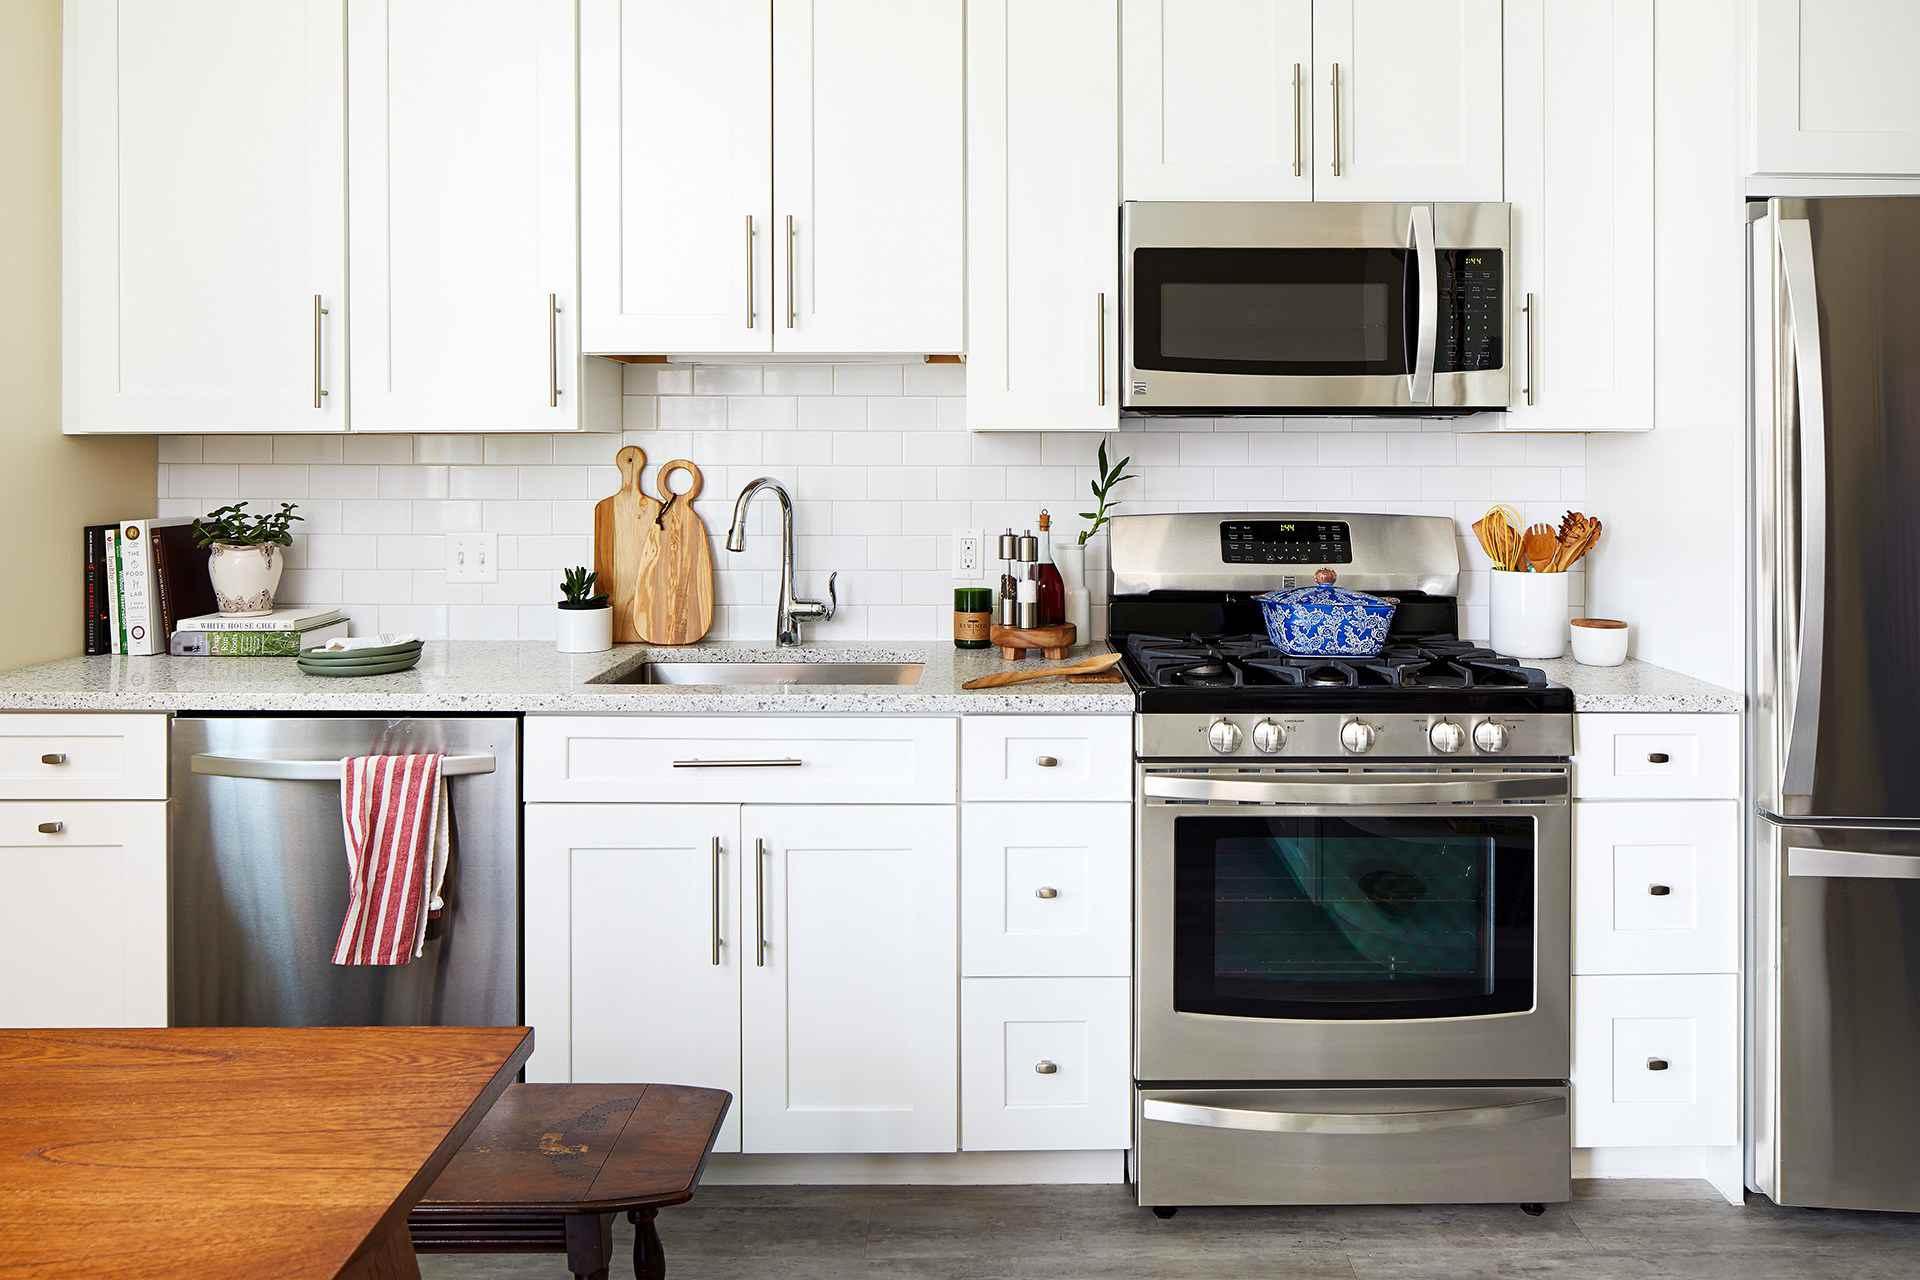 20 Granite Kitchen Countertops for Every Type of Decor on Farmhouse Granite Countertops  id=90845